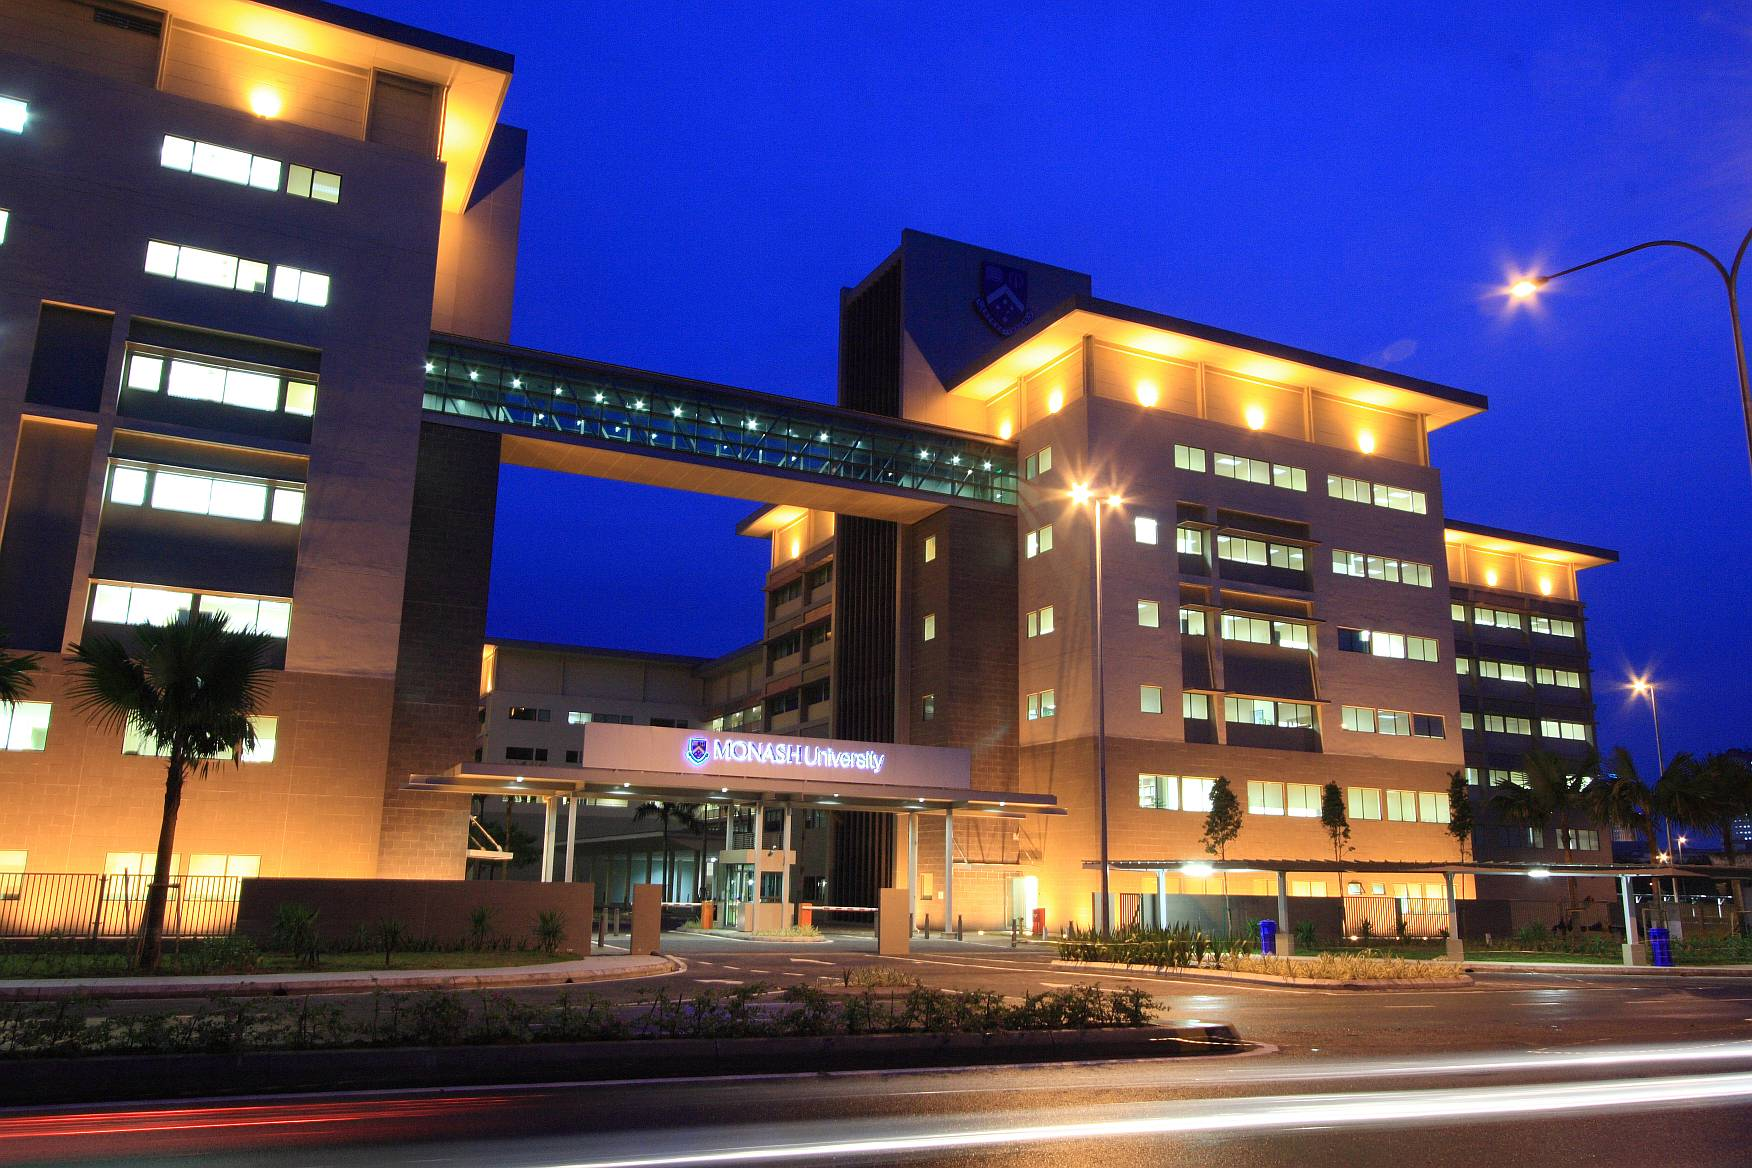 Monash University Sunway Campus (Night) - small